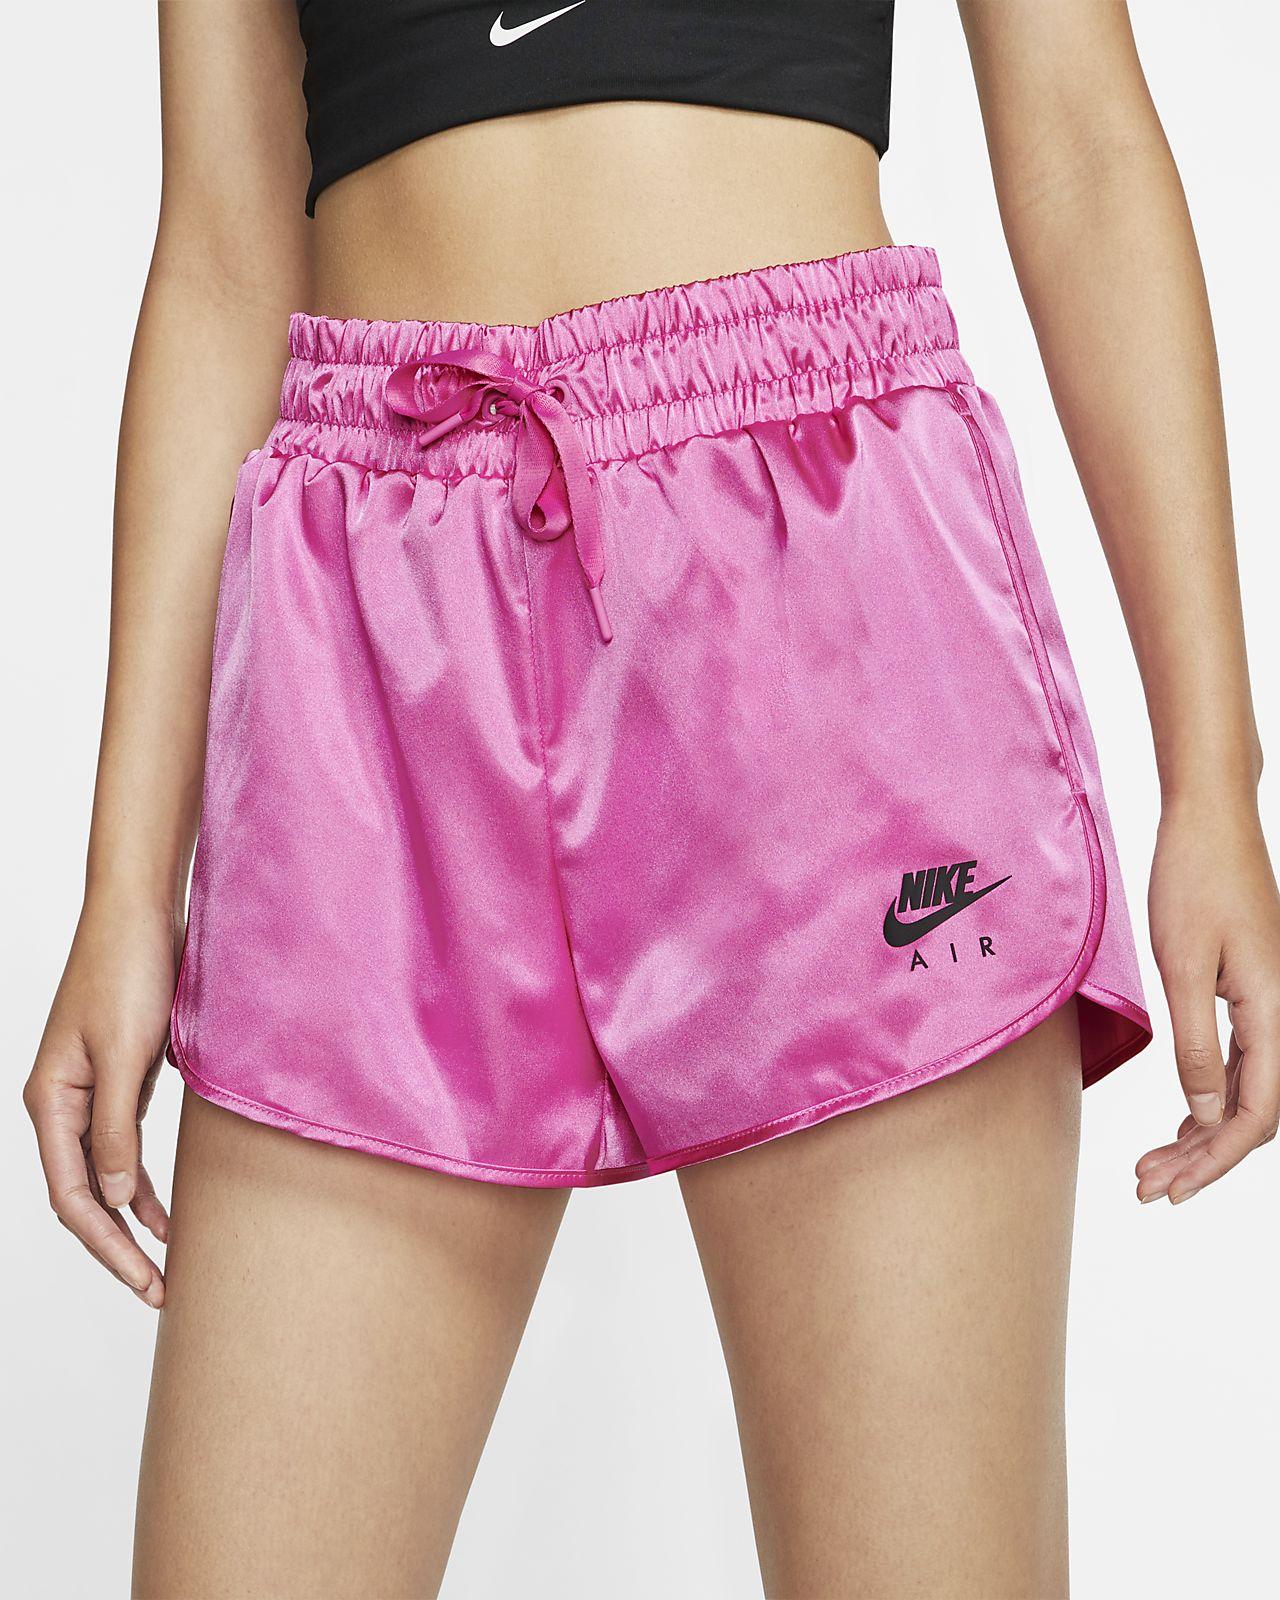 Nike Air Women's Satin Shorts